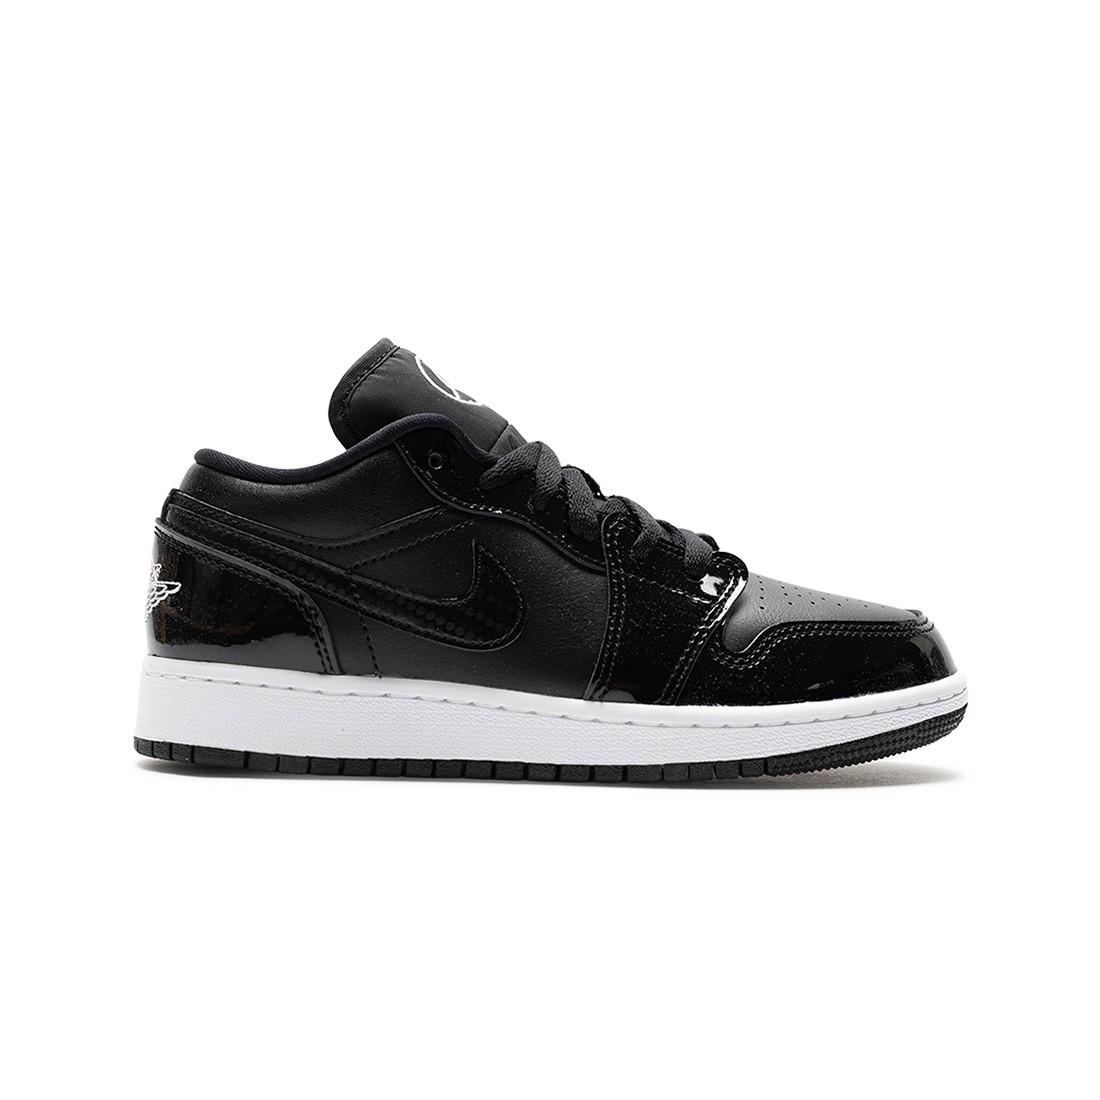 Air Jordan 1 Low SE Big Kids (black / white)